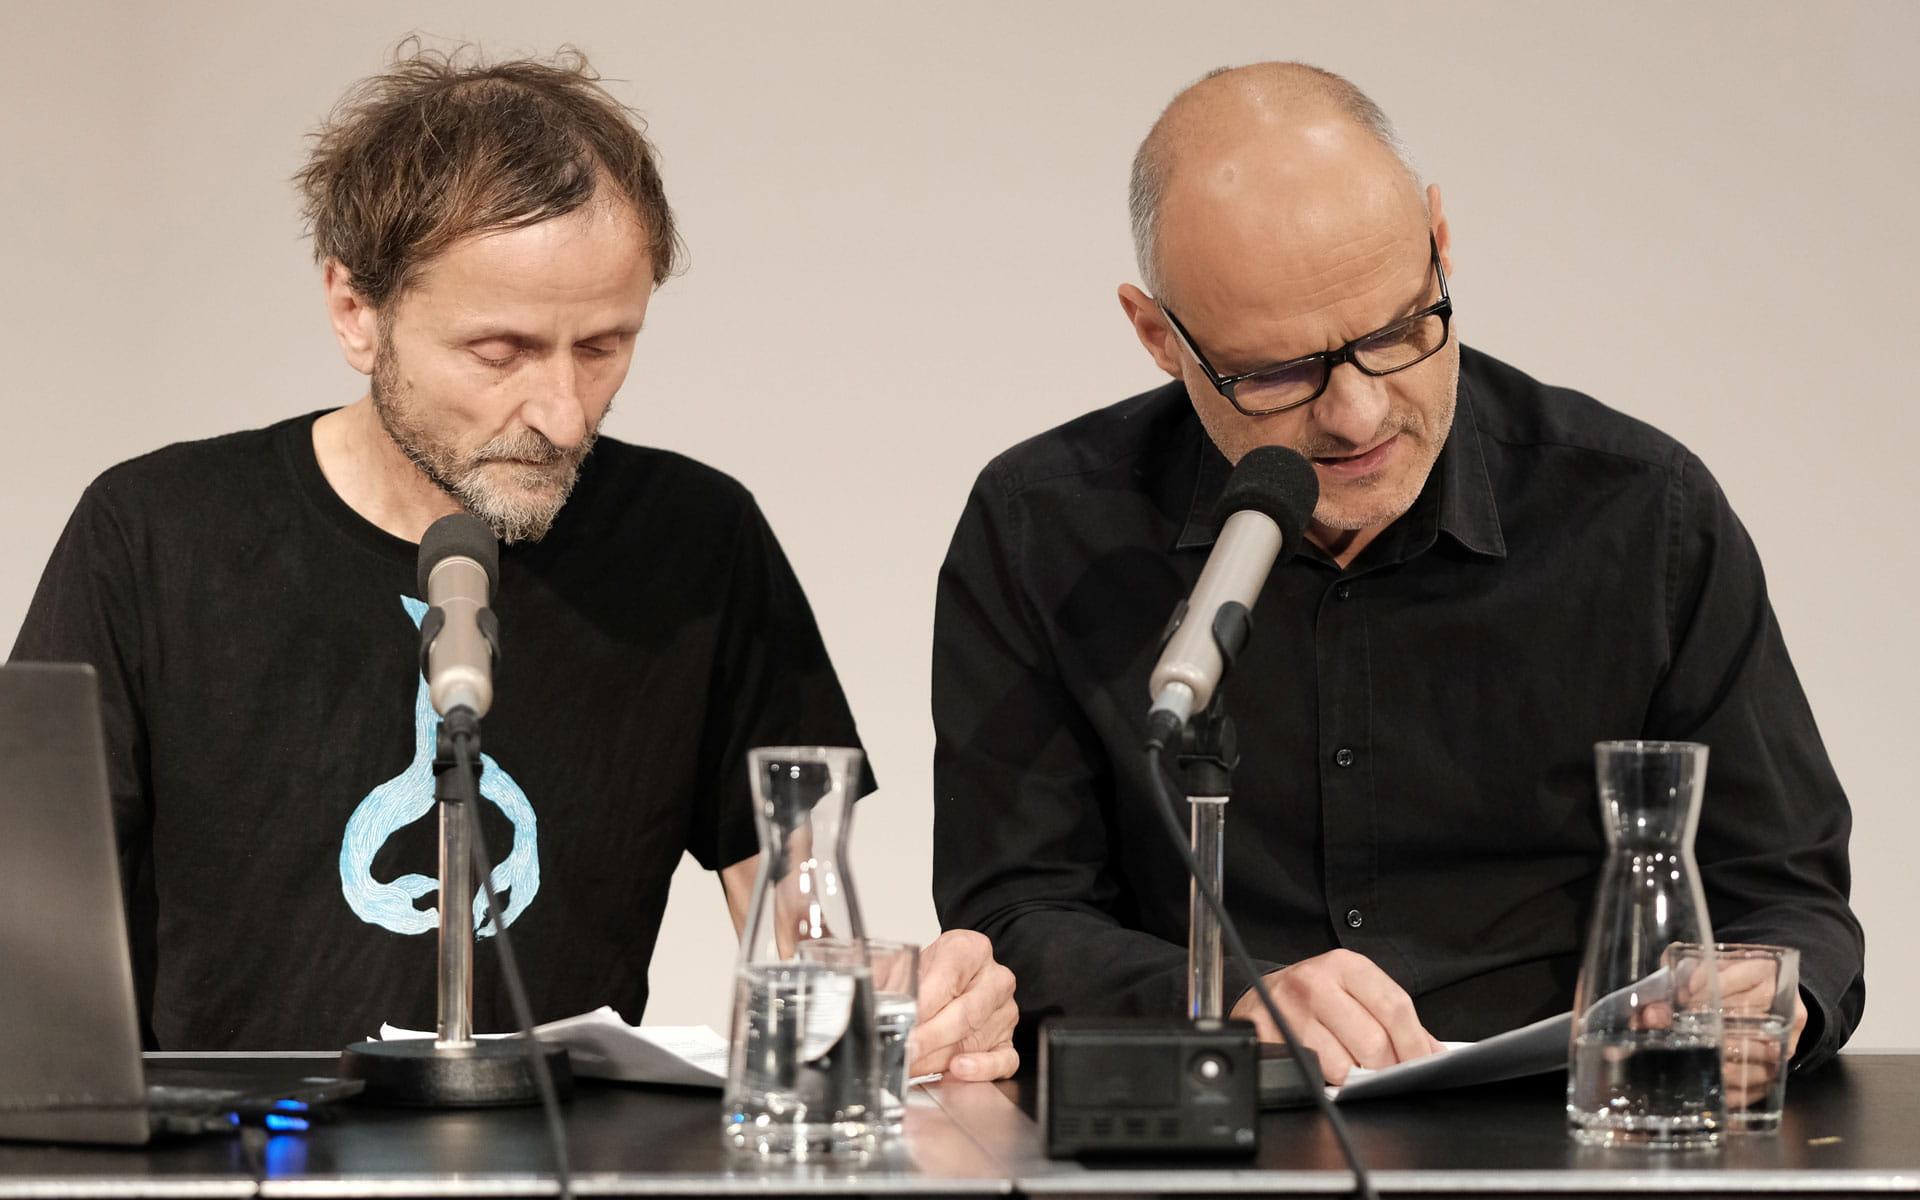 Franz Suess, Stefan Mäser: Paul Zwei <br/>(c) Sebastian Wenzel